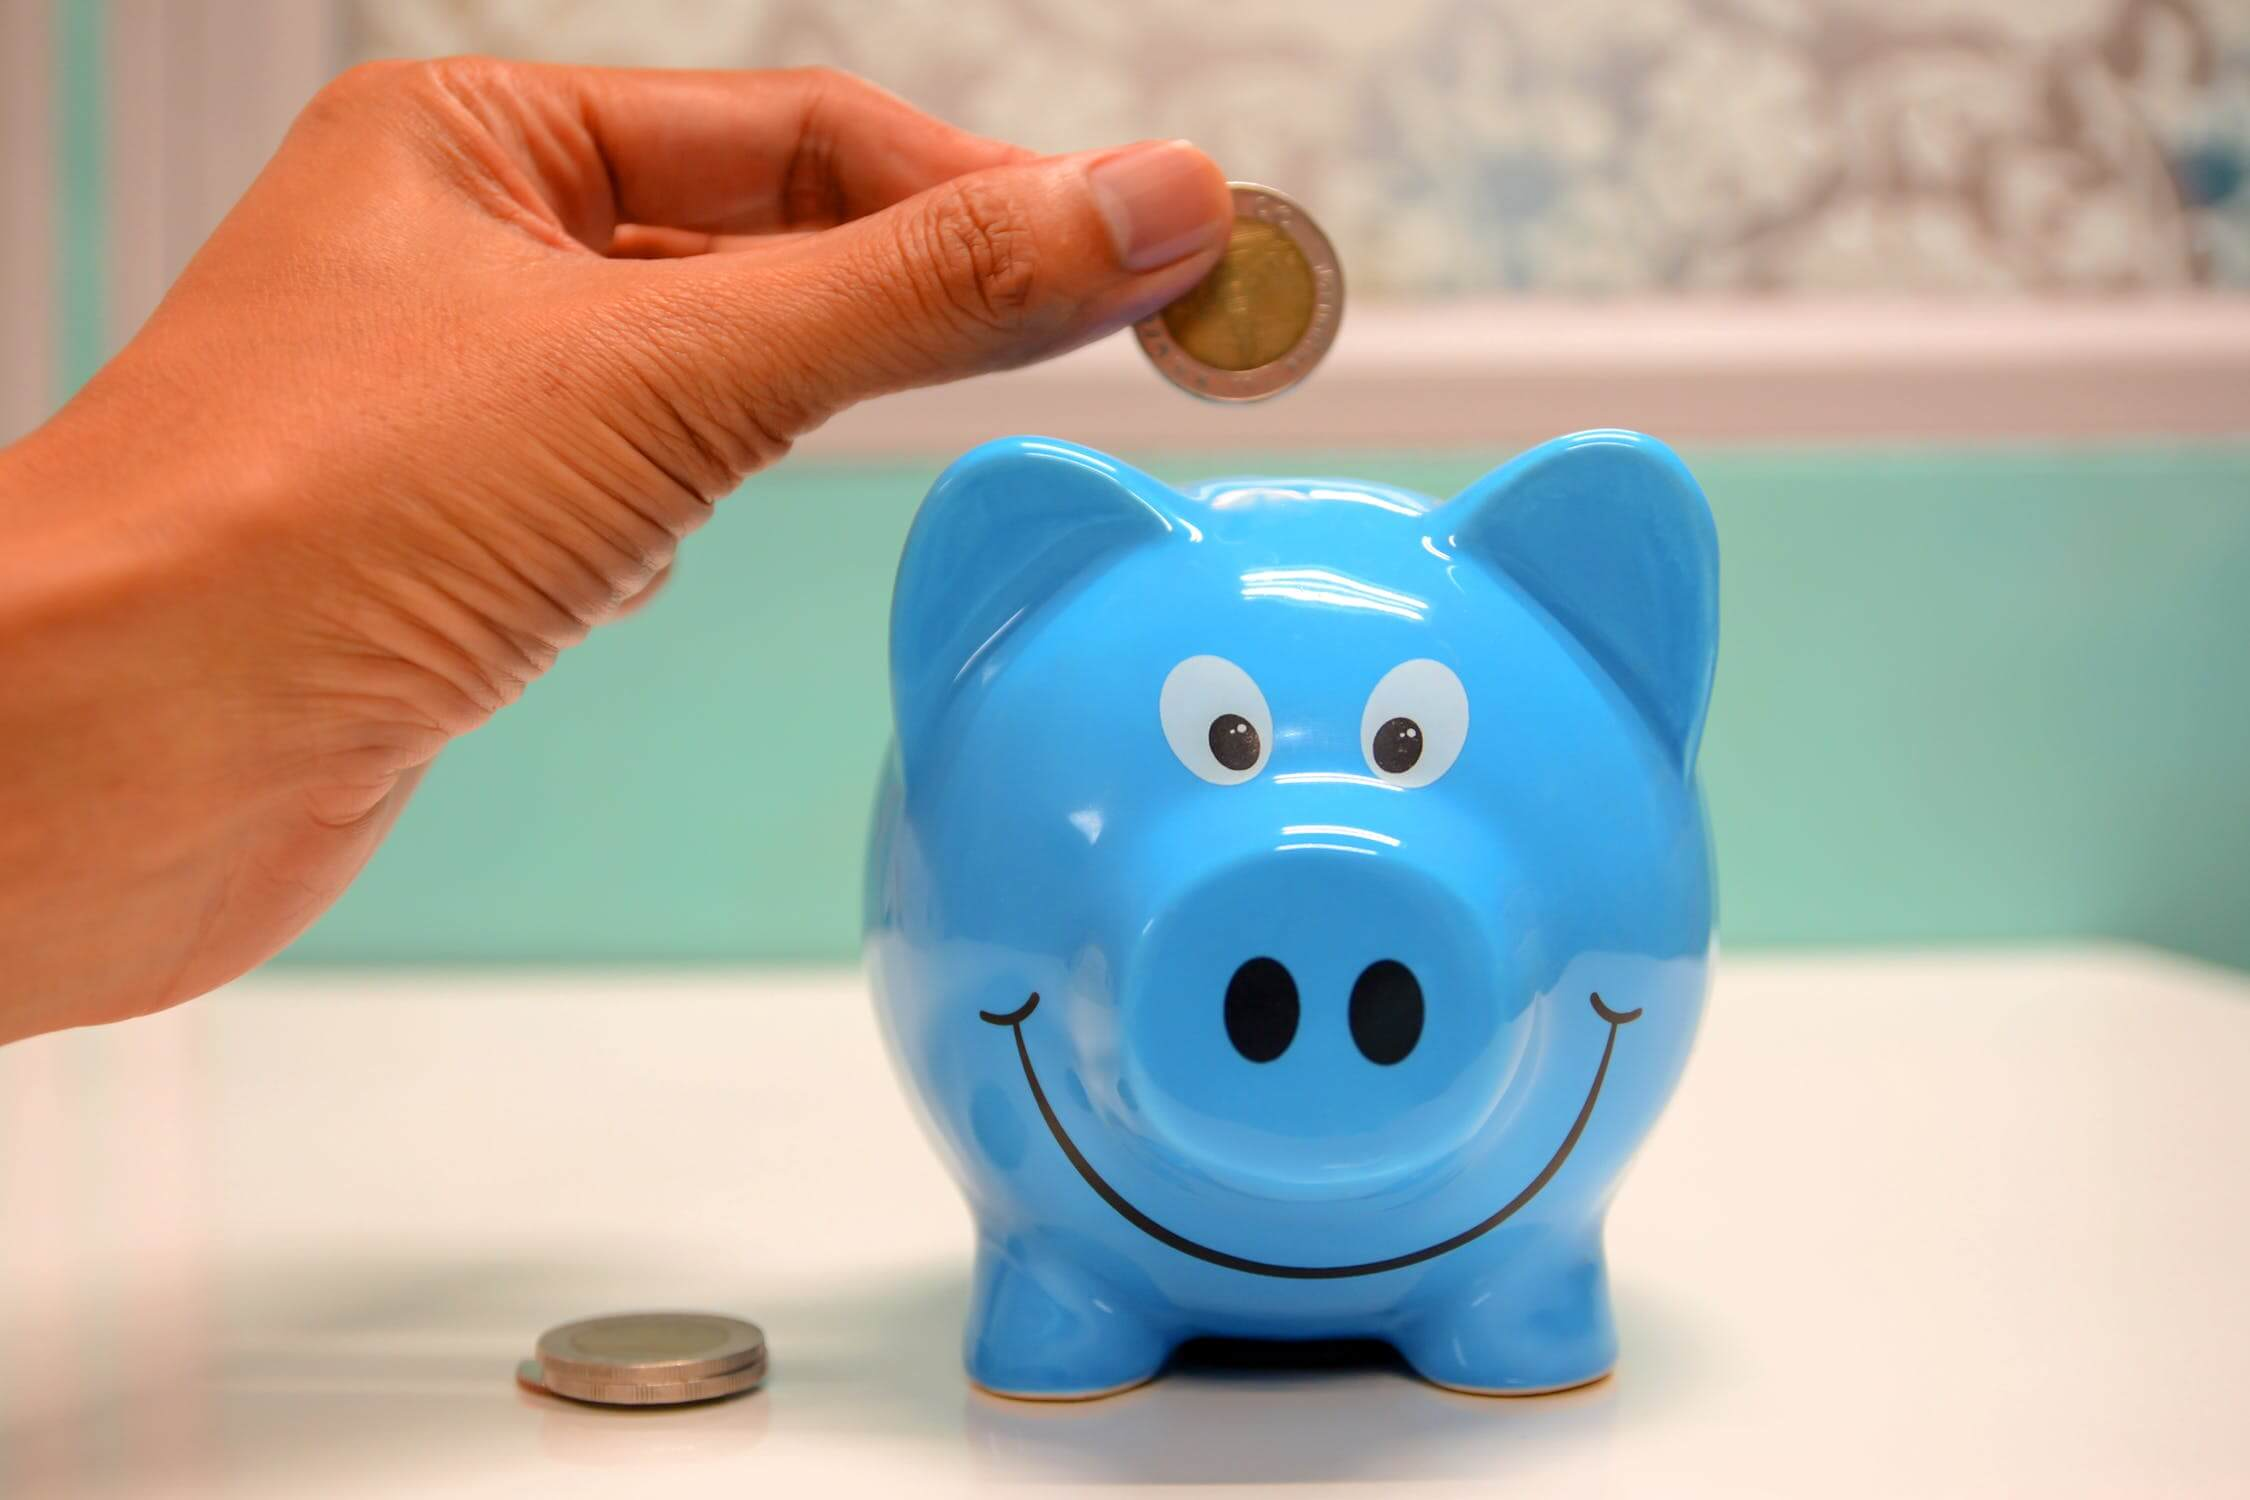 A blue piggy bank where individuals can save money